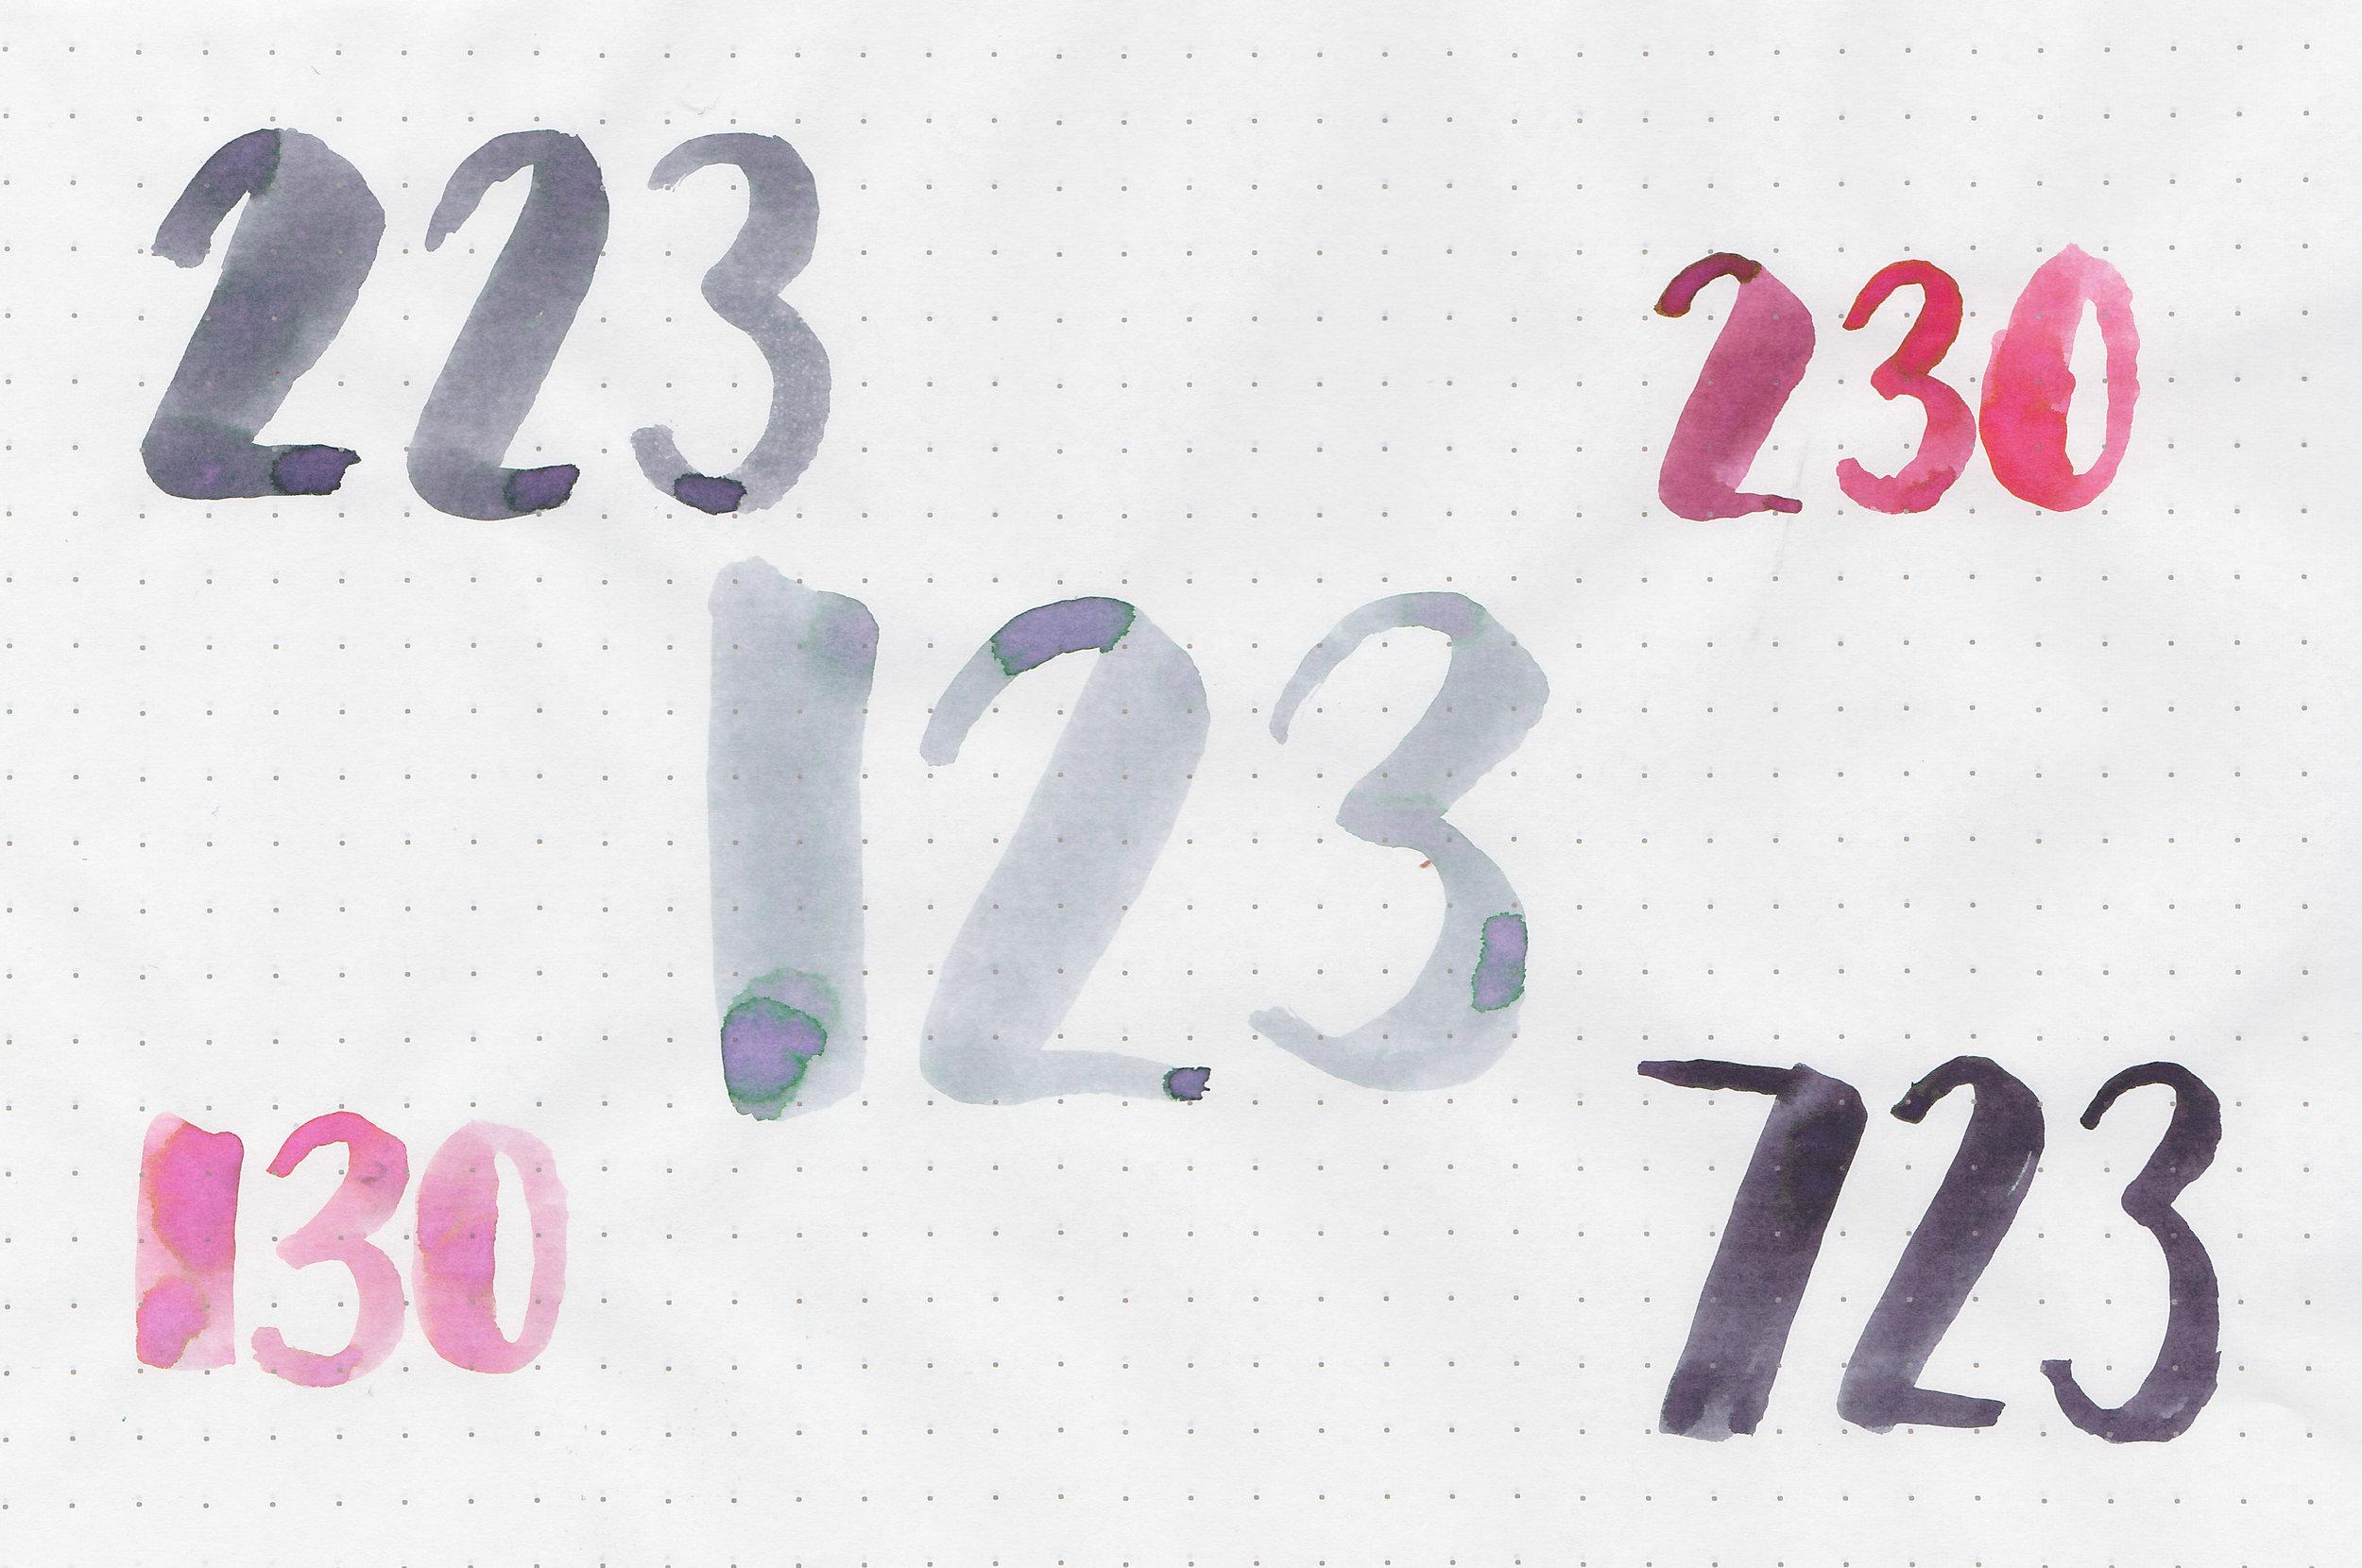 sis-set1-6.jpg